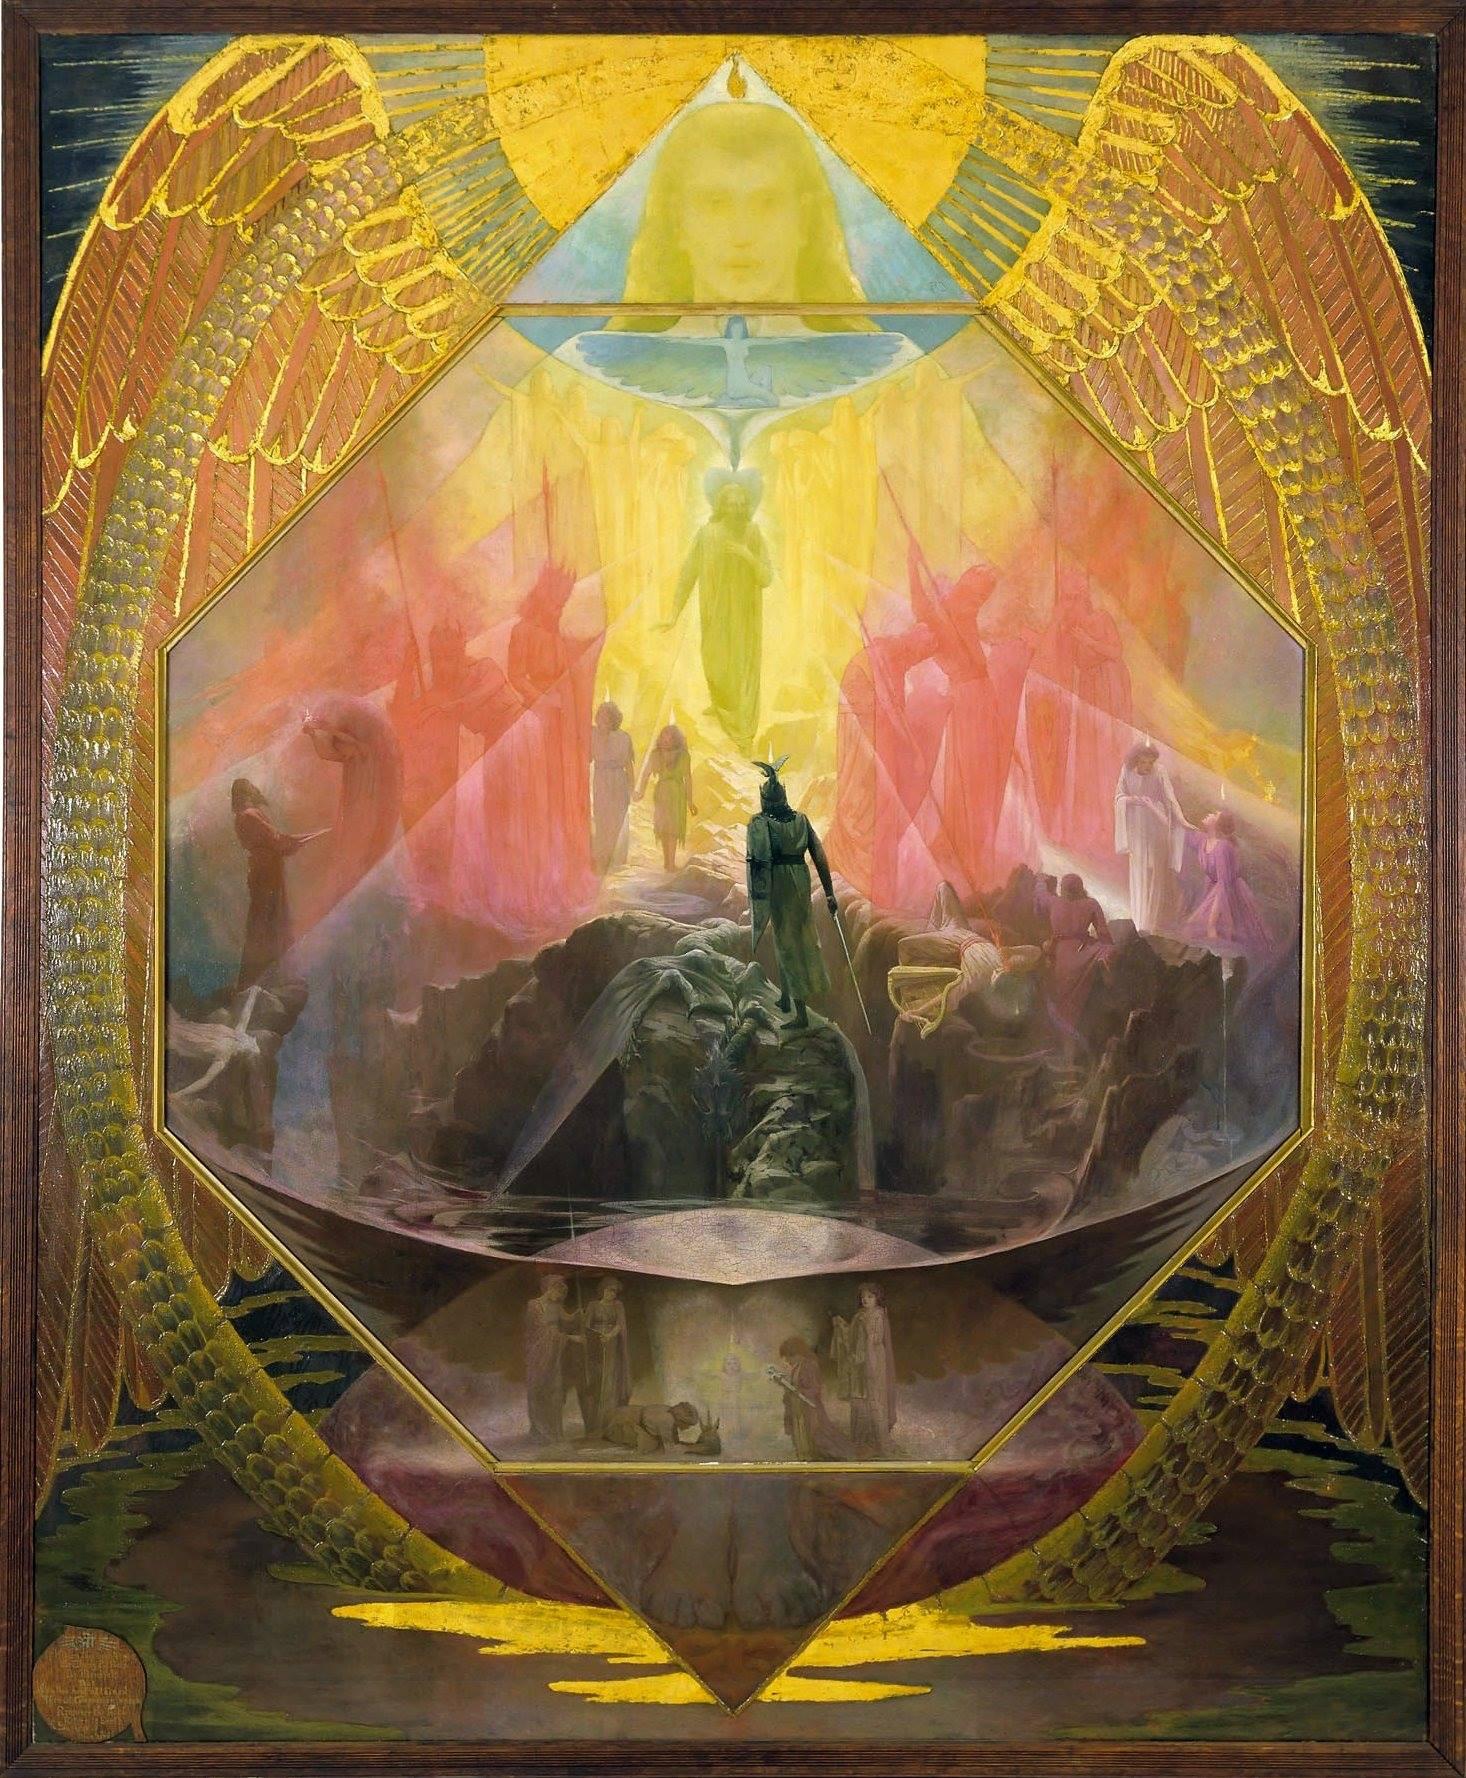 The Path, by Reginald W. Machell